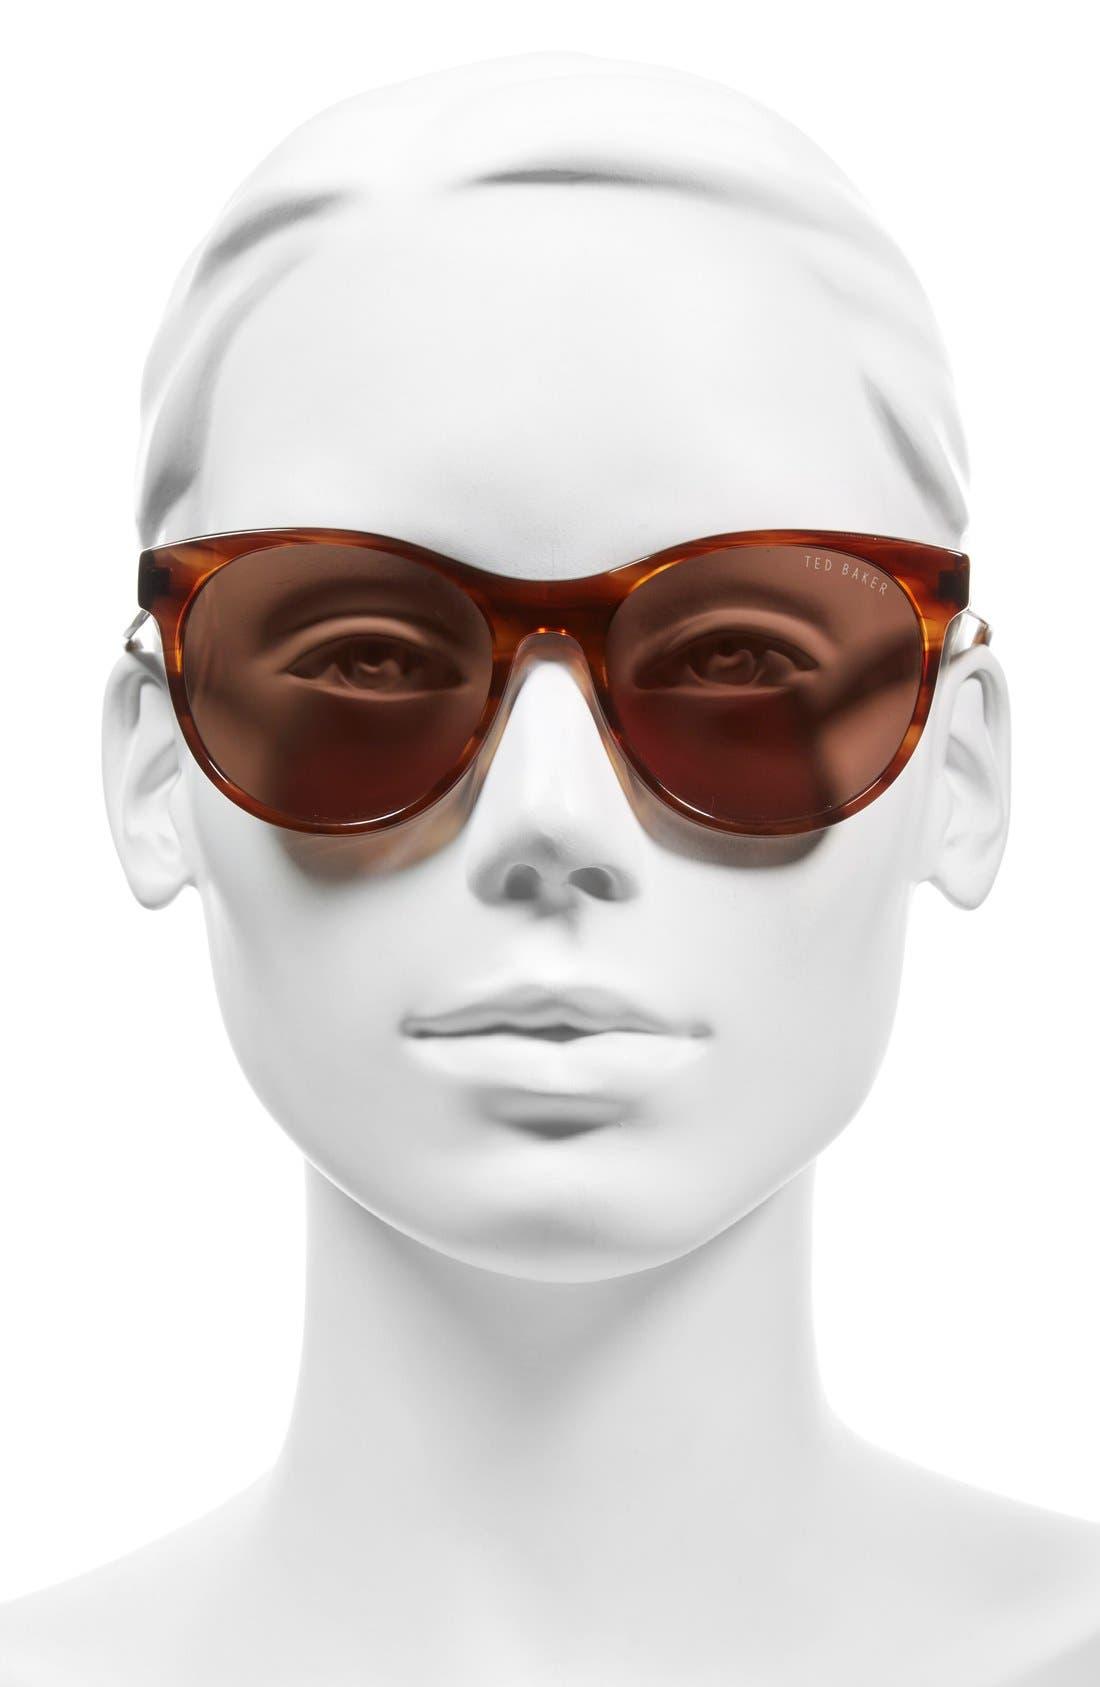 54mm Retro Sunglasses,                             Alternate thumbnail 8, color,